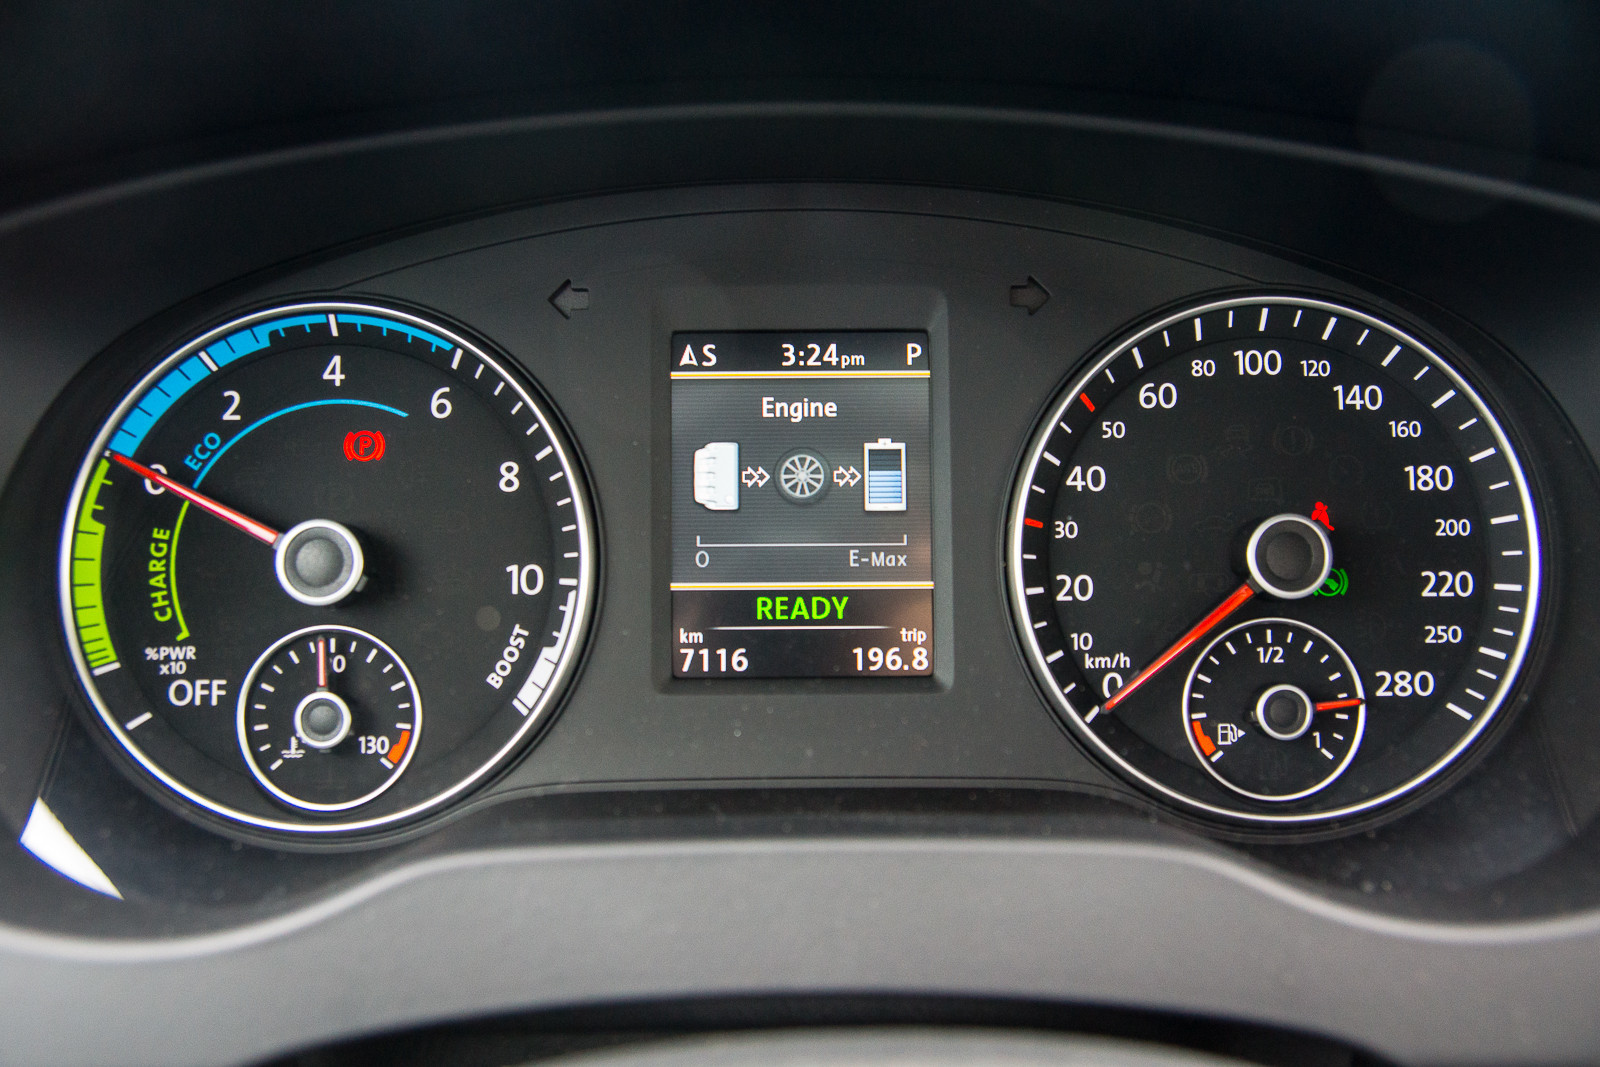 blue vw kelley news jetta quick book hybrid volkswagen all latest car take the